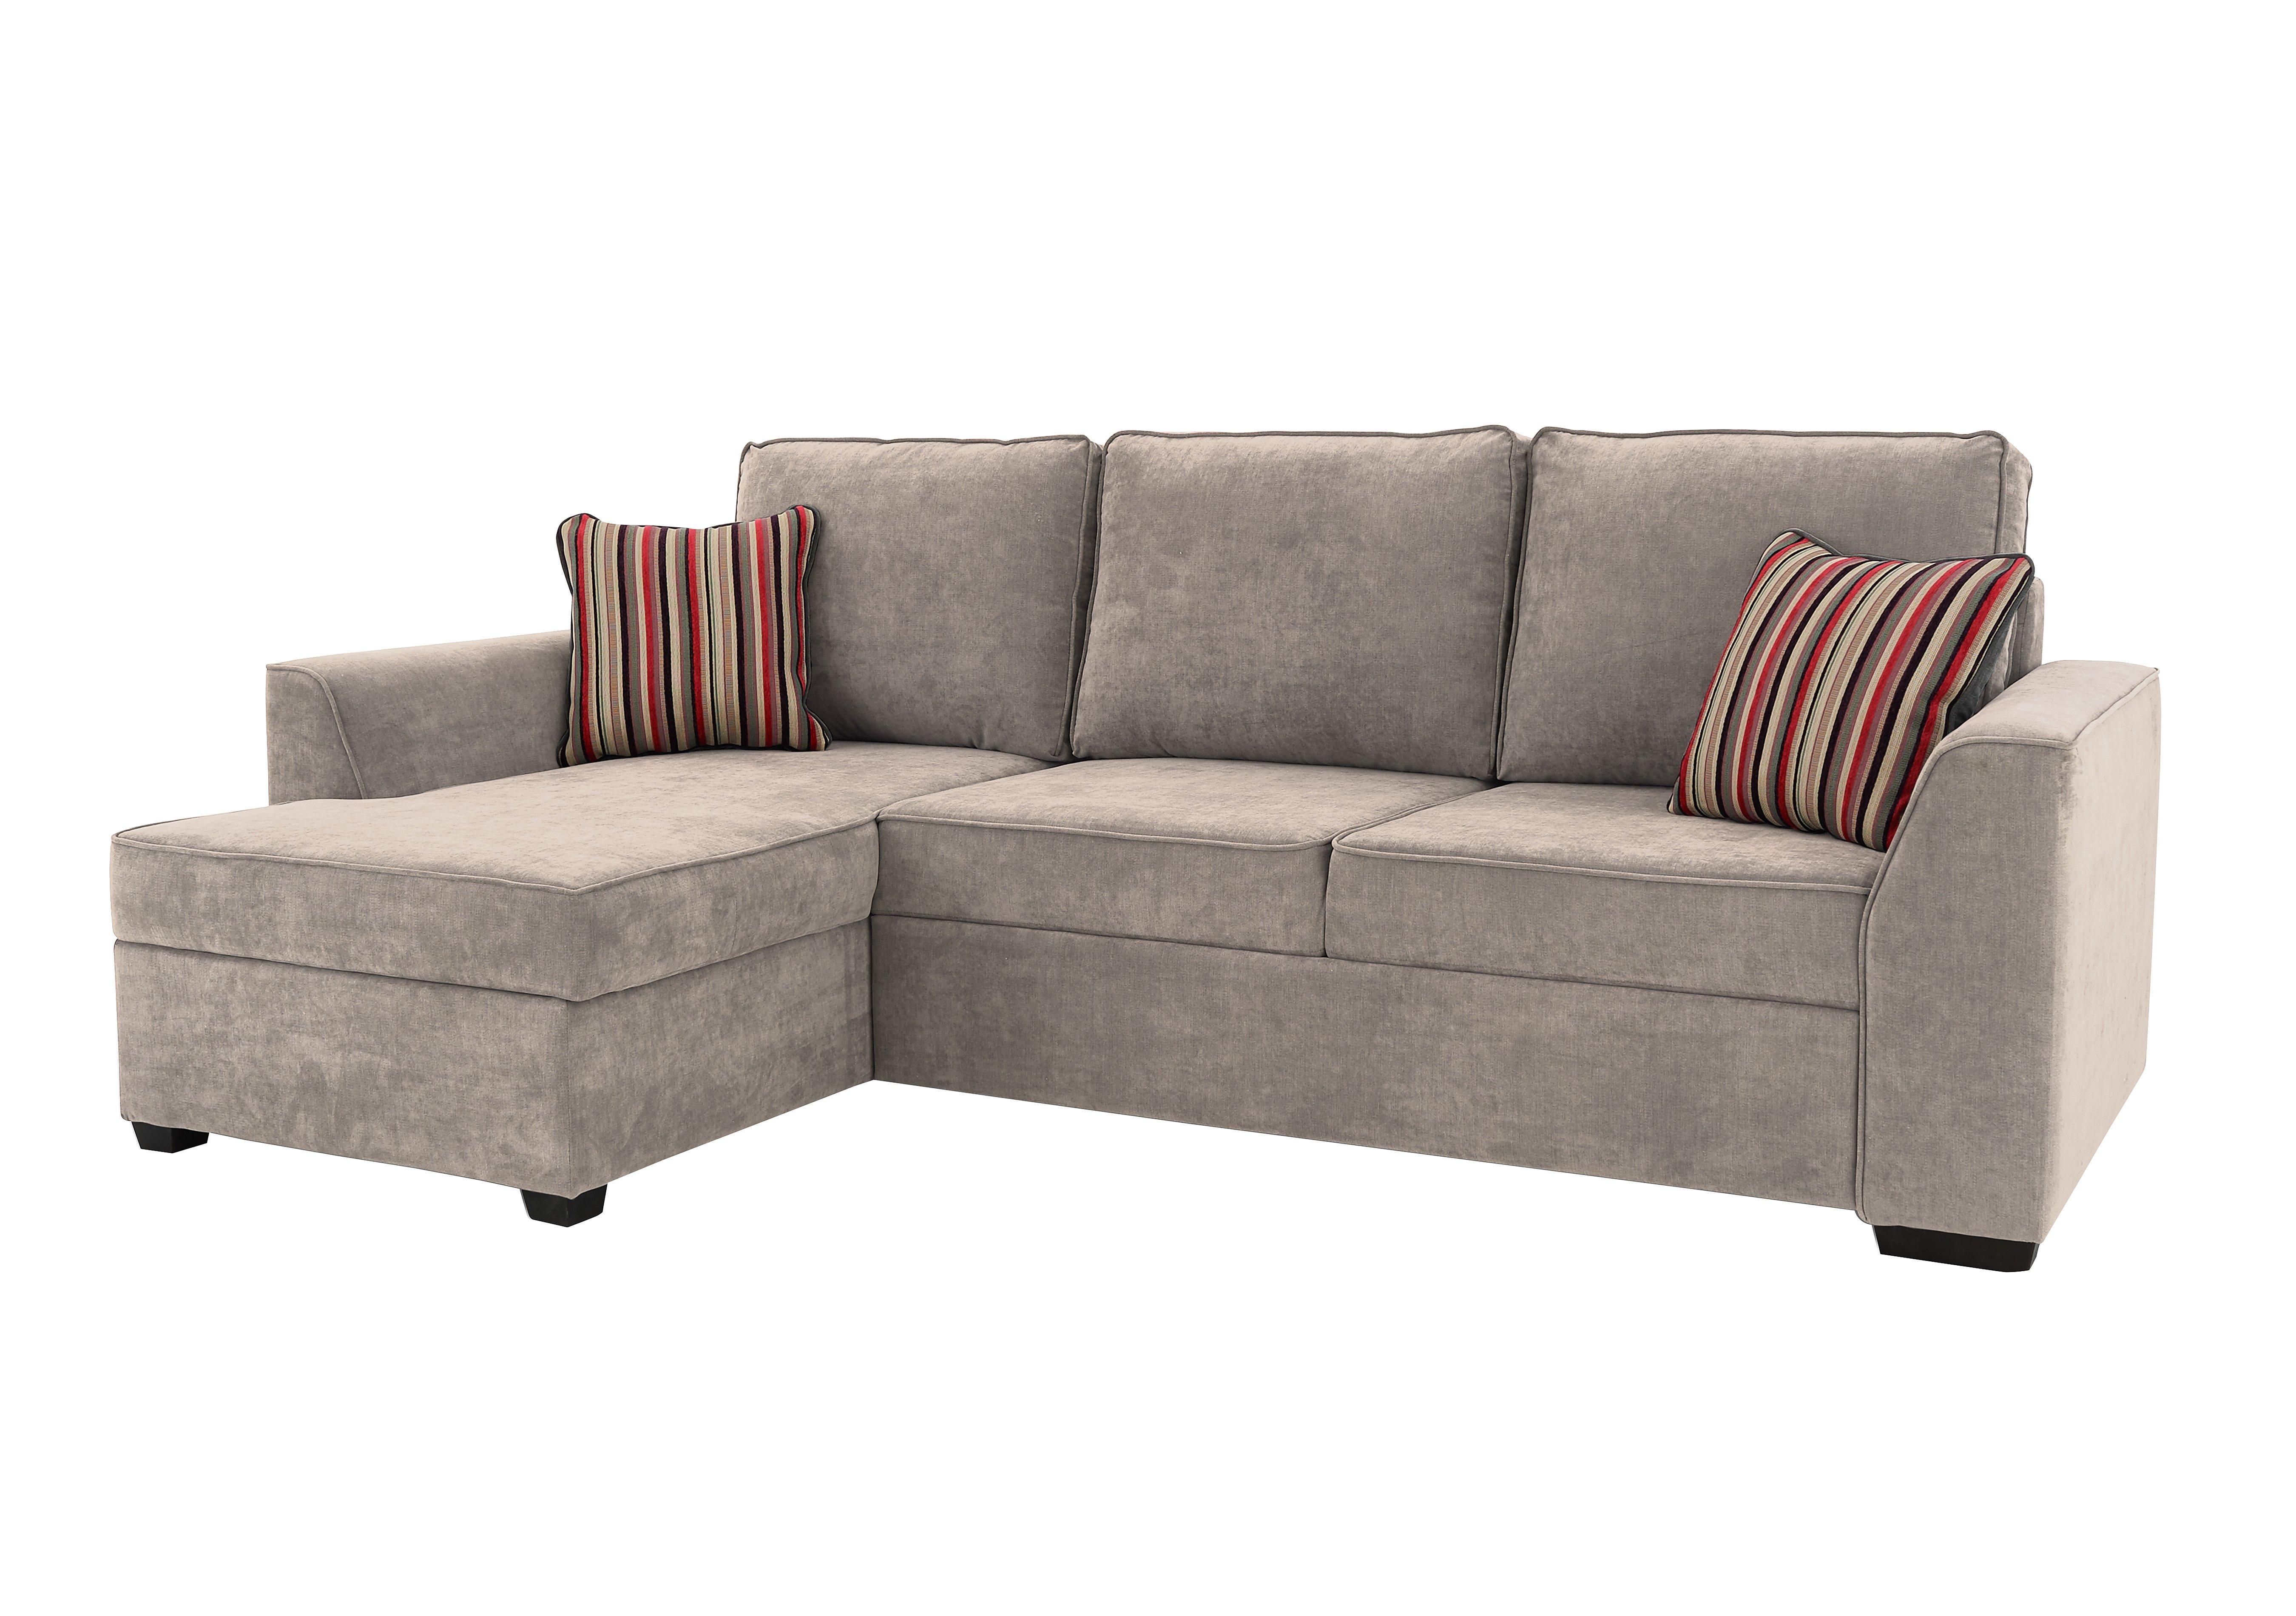 Studio 3 Seater Fabric Sofa Bed Furniture Village